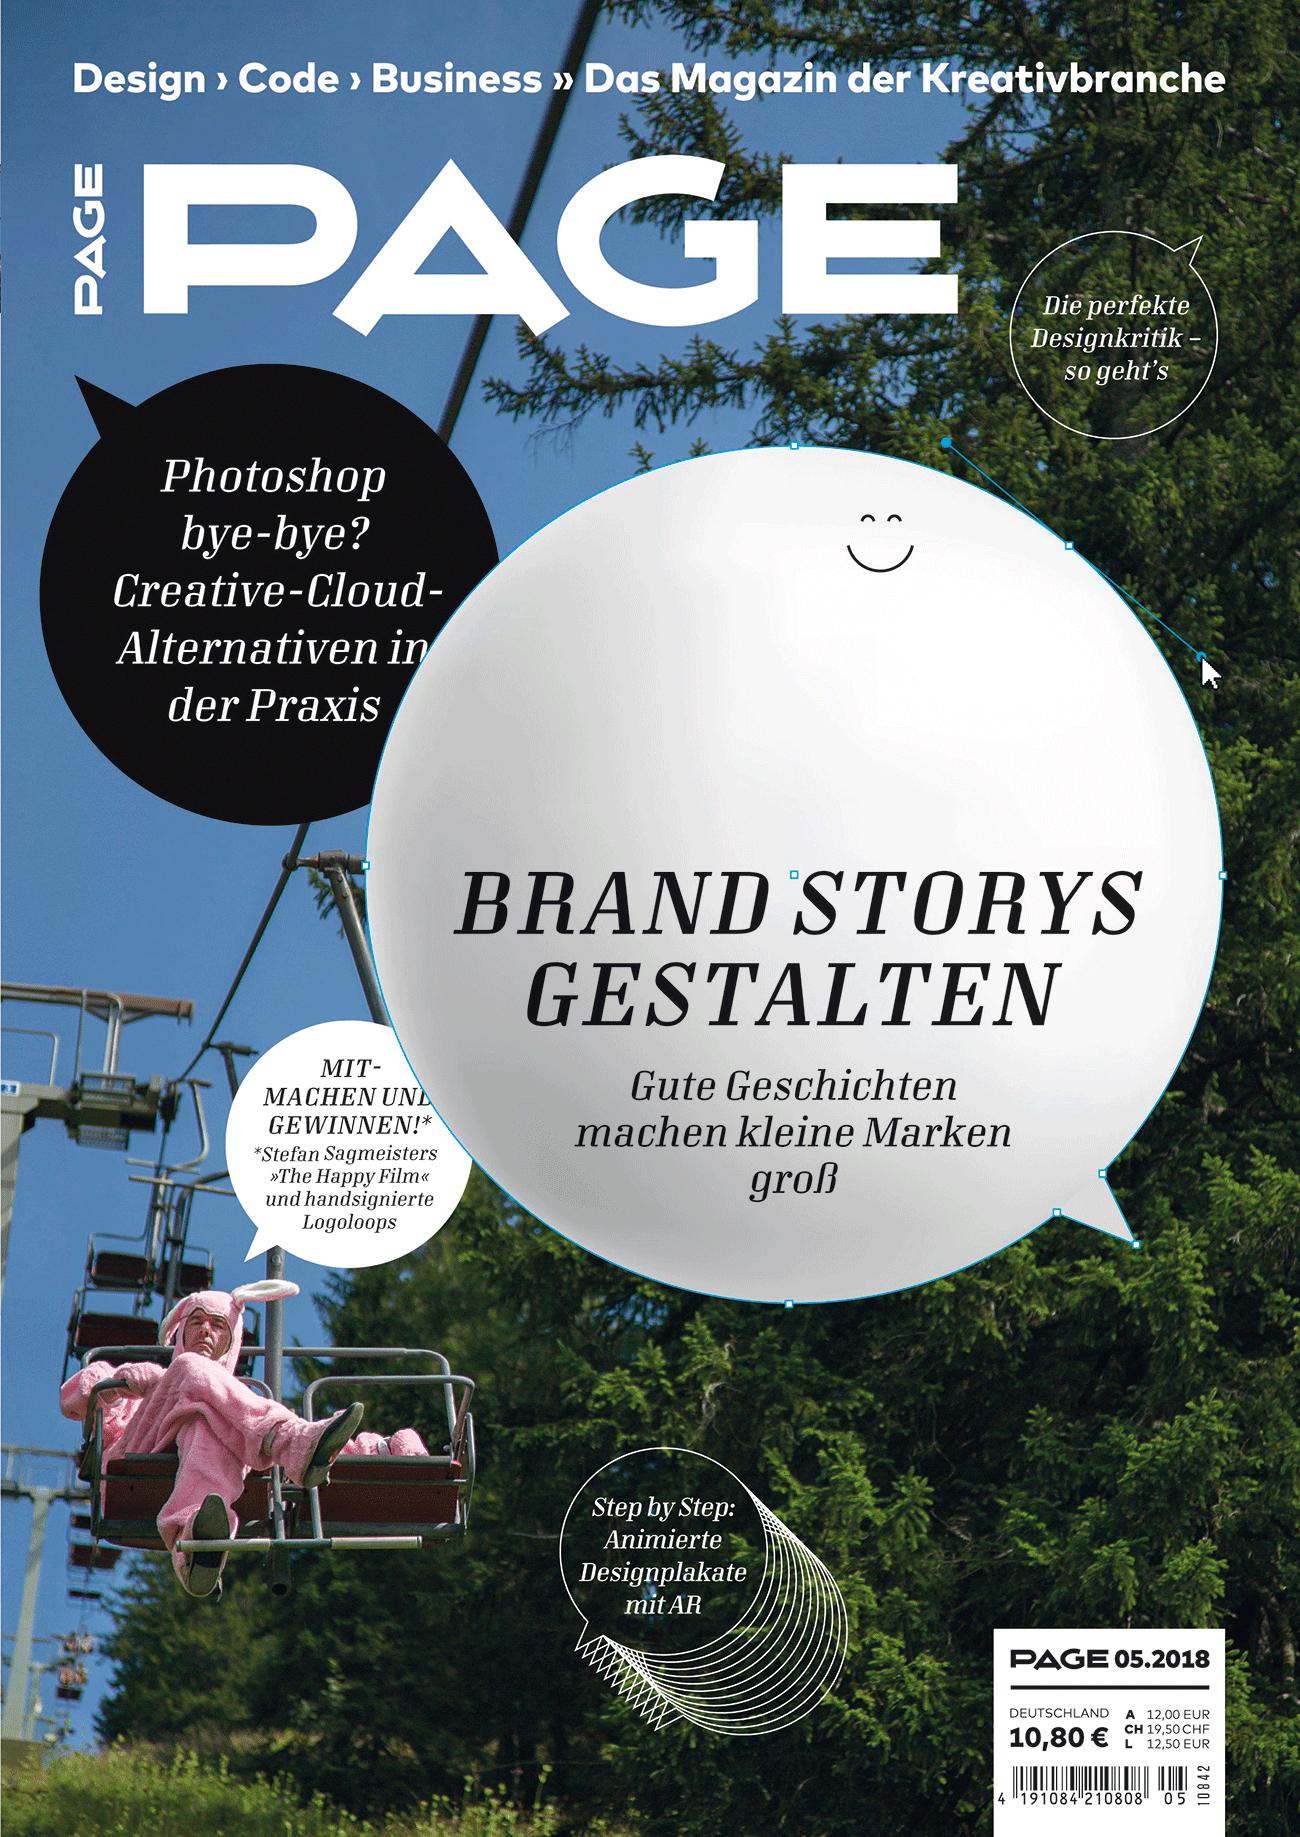 Branding, Rebranding, Marketing, Kommunikationsdesign, Corporate Identity, Design, Storytelling